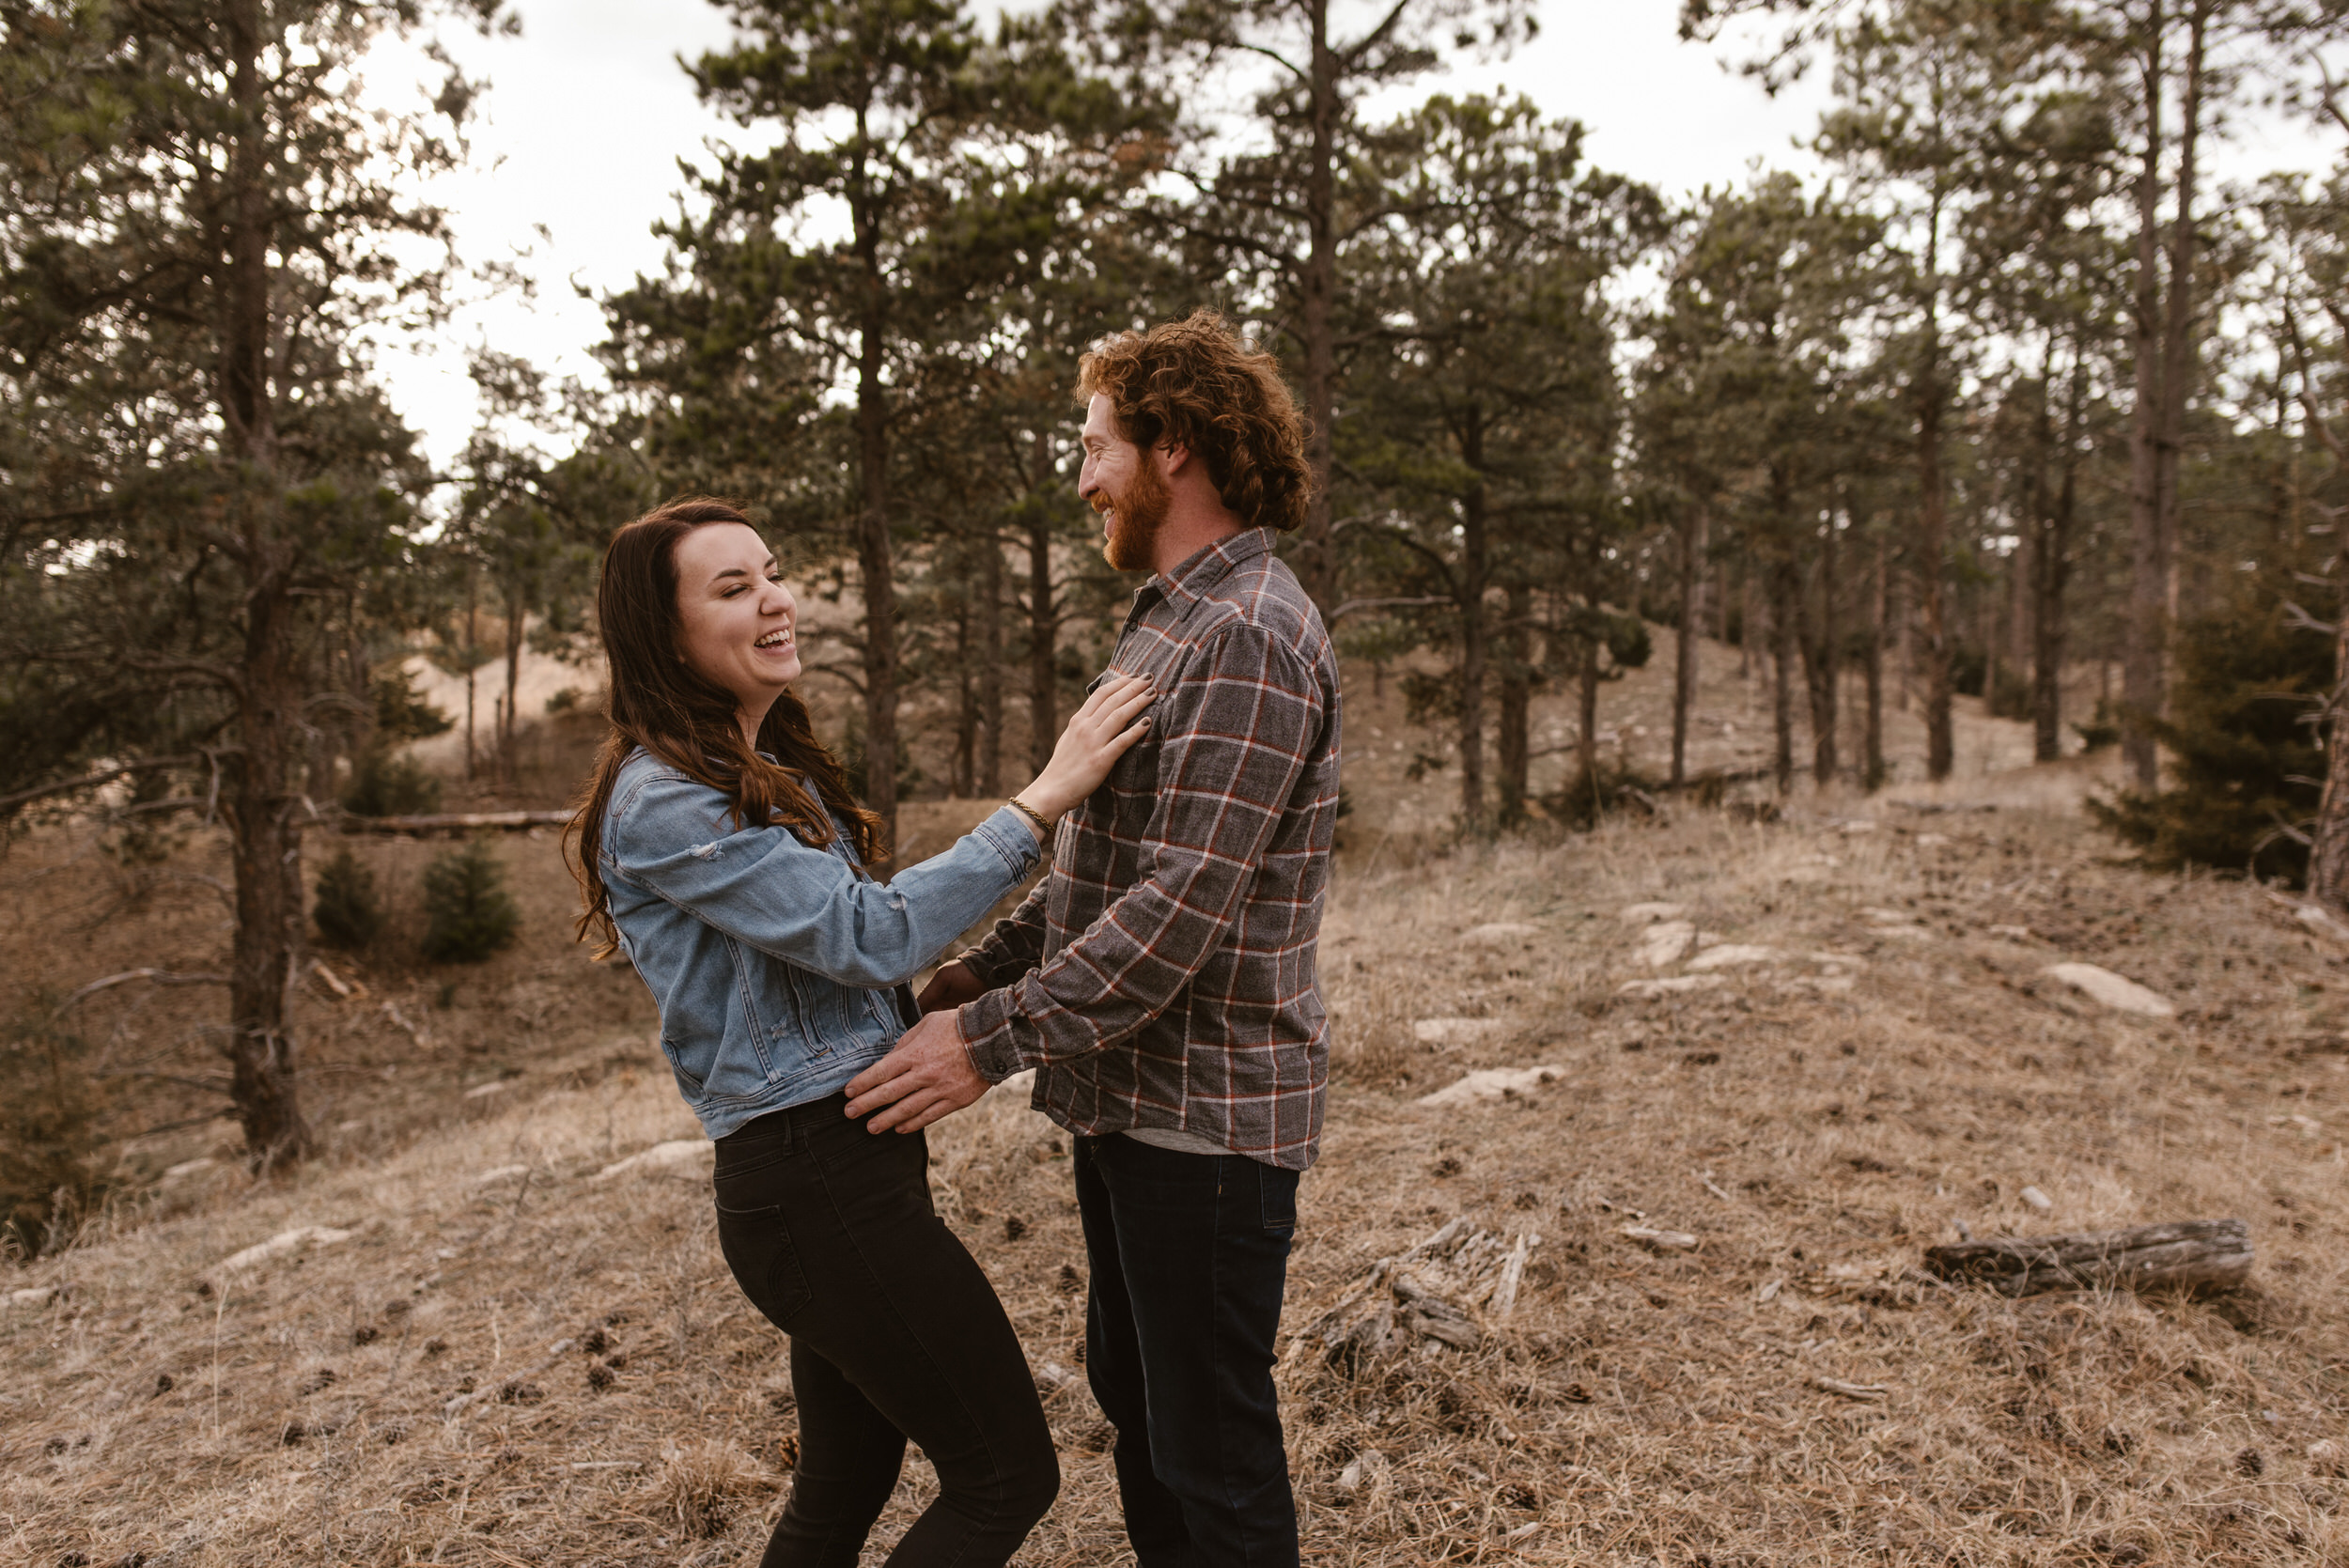 Nebraska-Engagement-Session-Halsey-Forest-Kaylie-Sirek-Photography-017.jpg